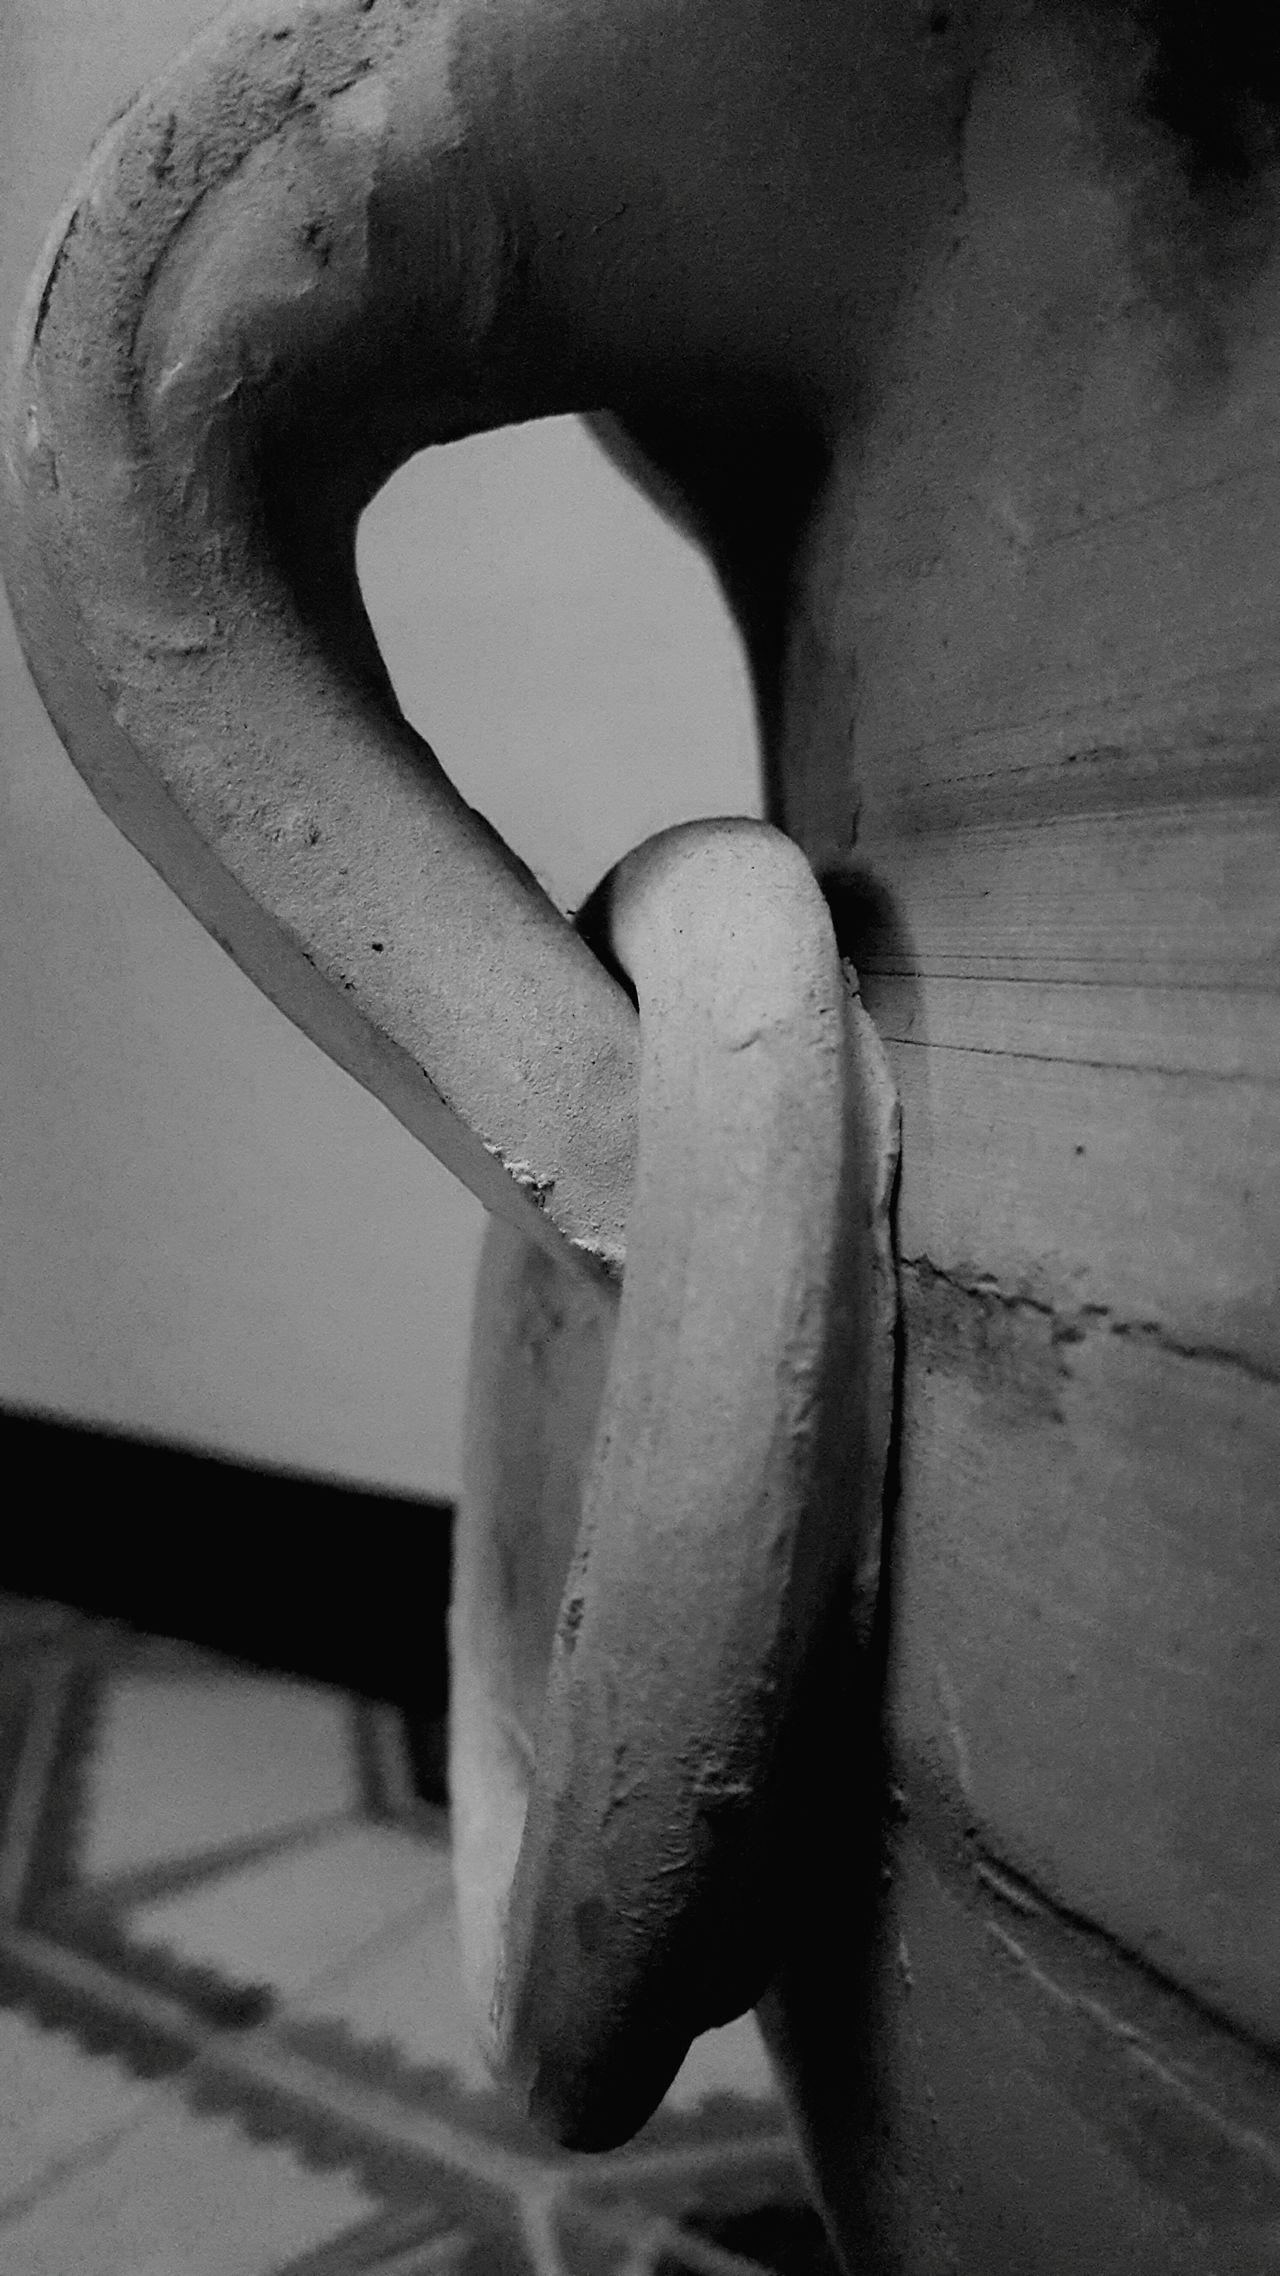 Detail Of Roman Amphora